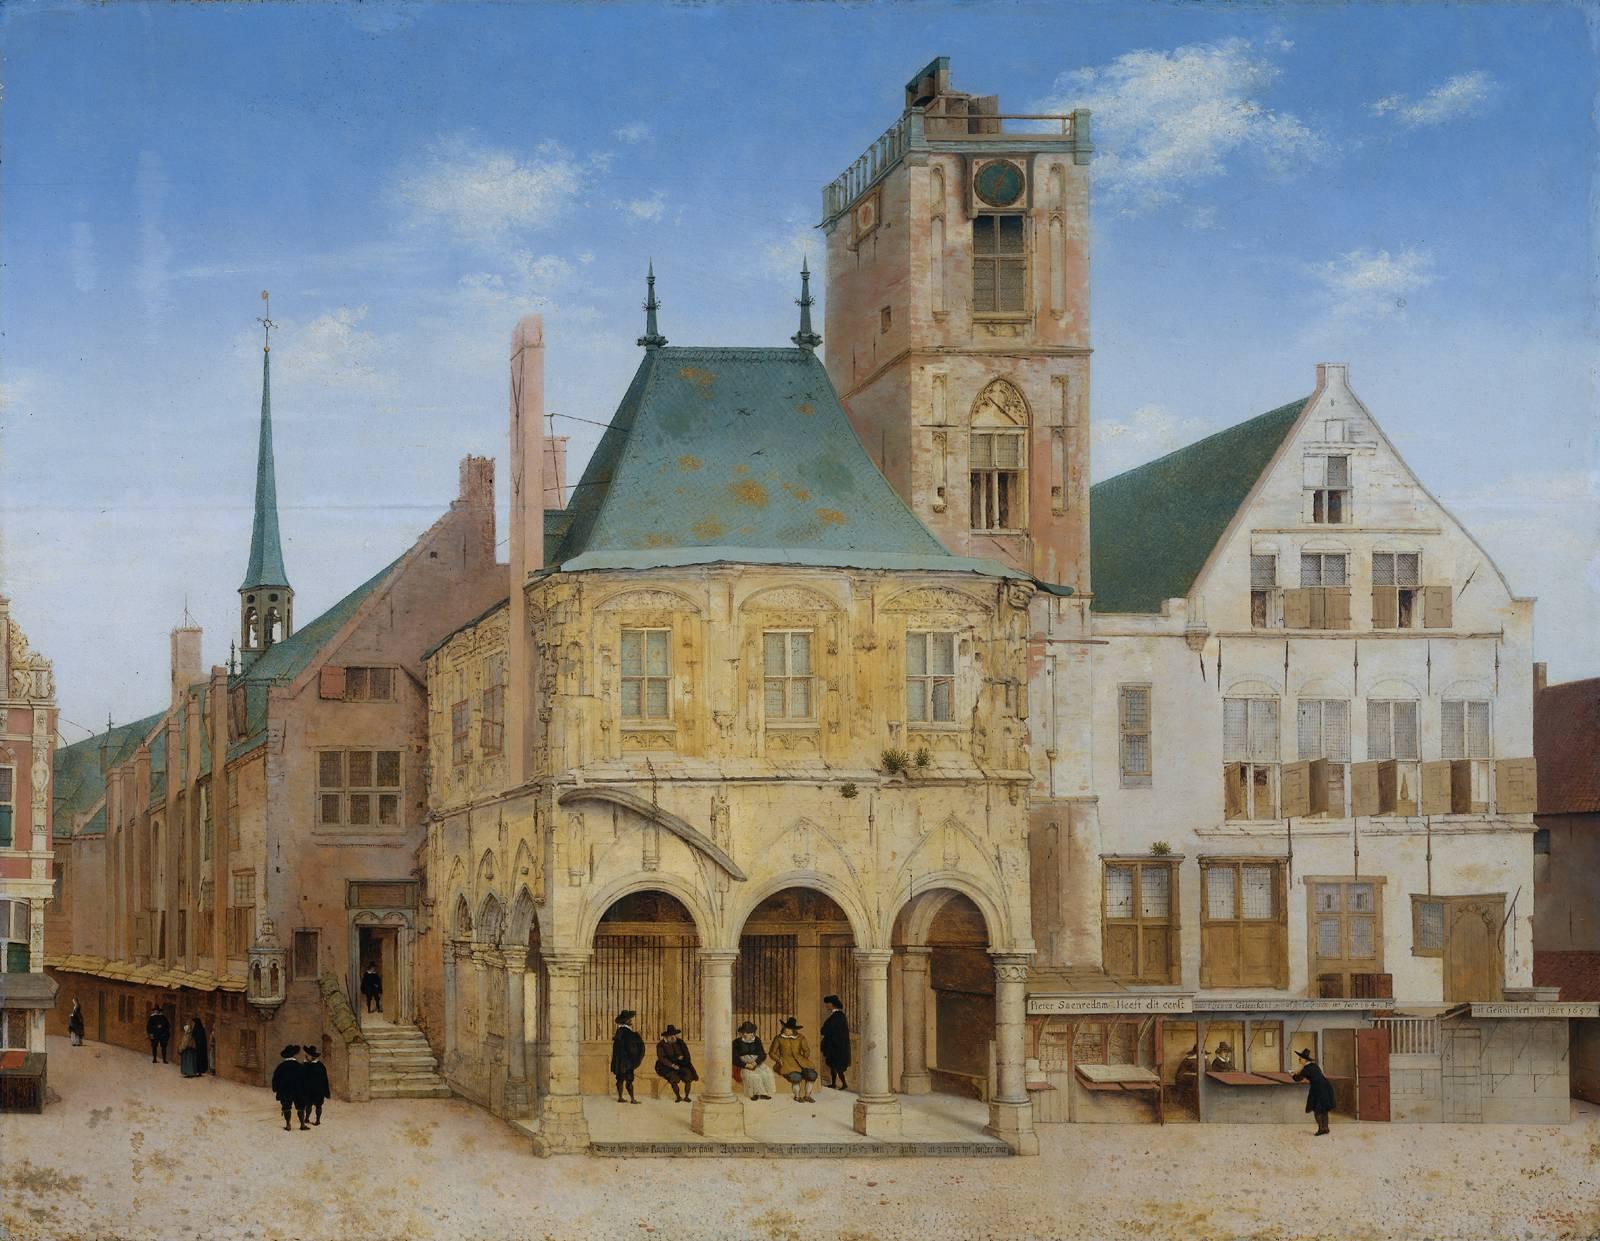 The Amsterdam Exchange Bank